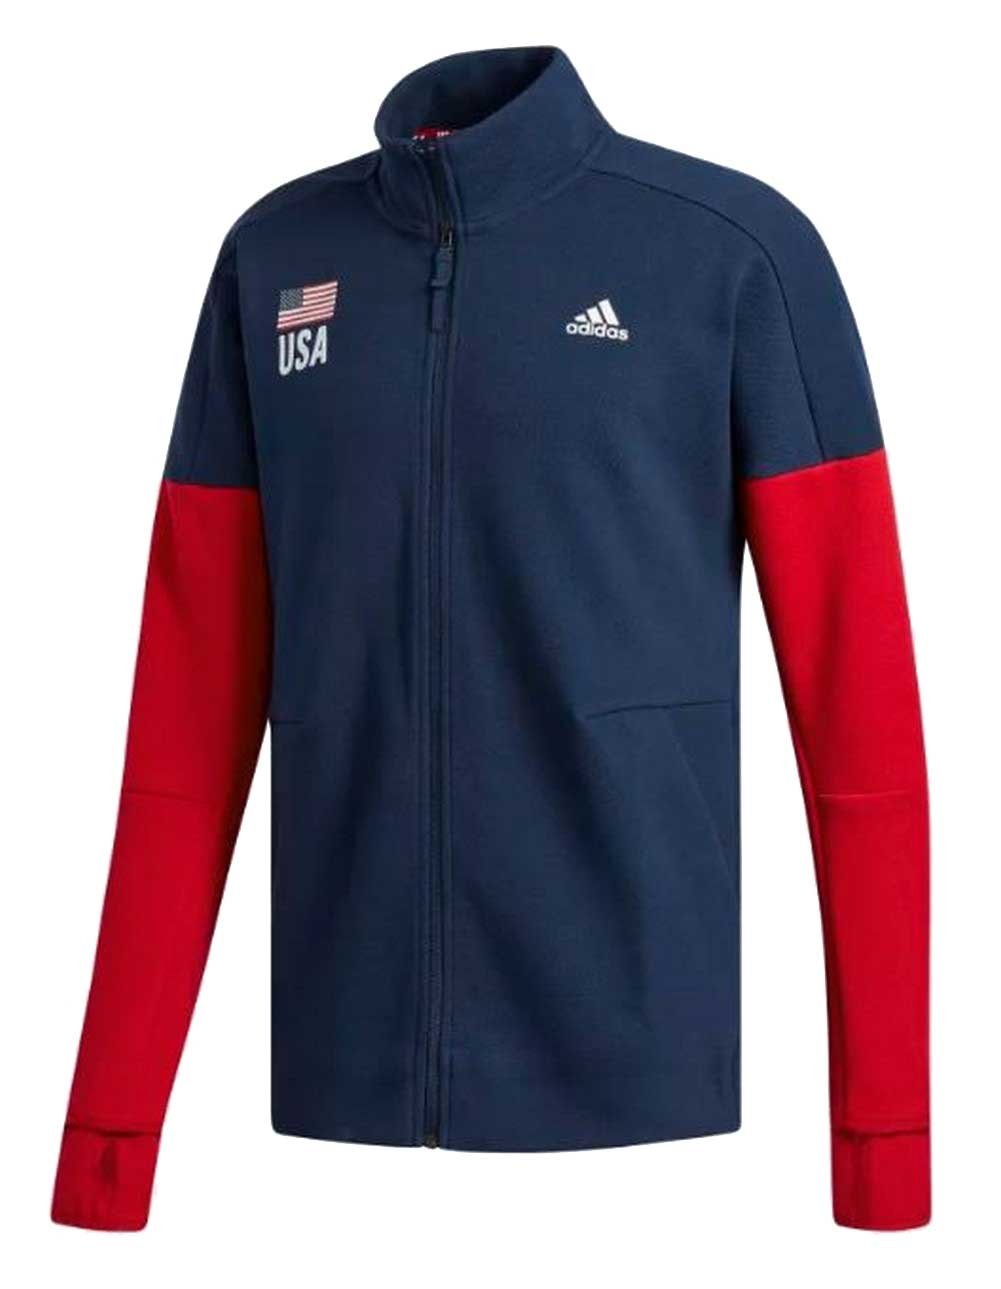 Details about Adidas Men's USA Flag Volleyball Warm up Jacket Coat Sweatshirt NavyRed CF1599